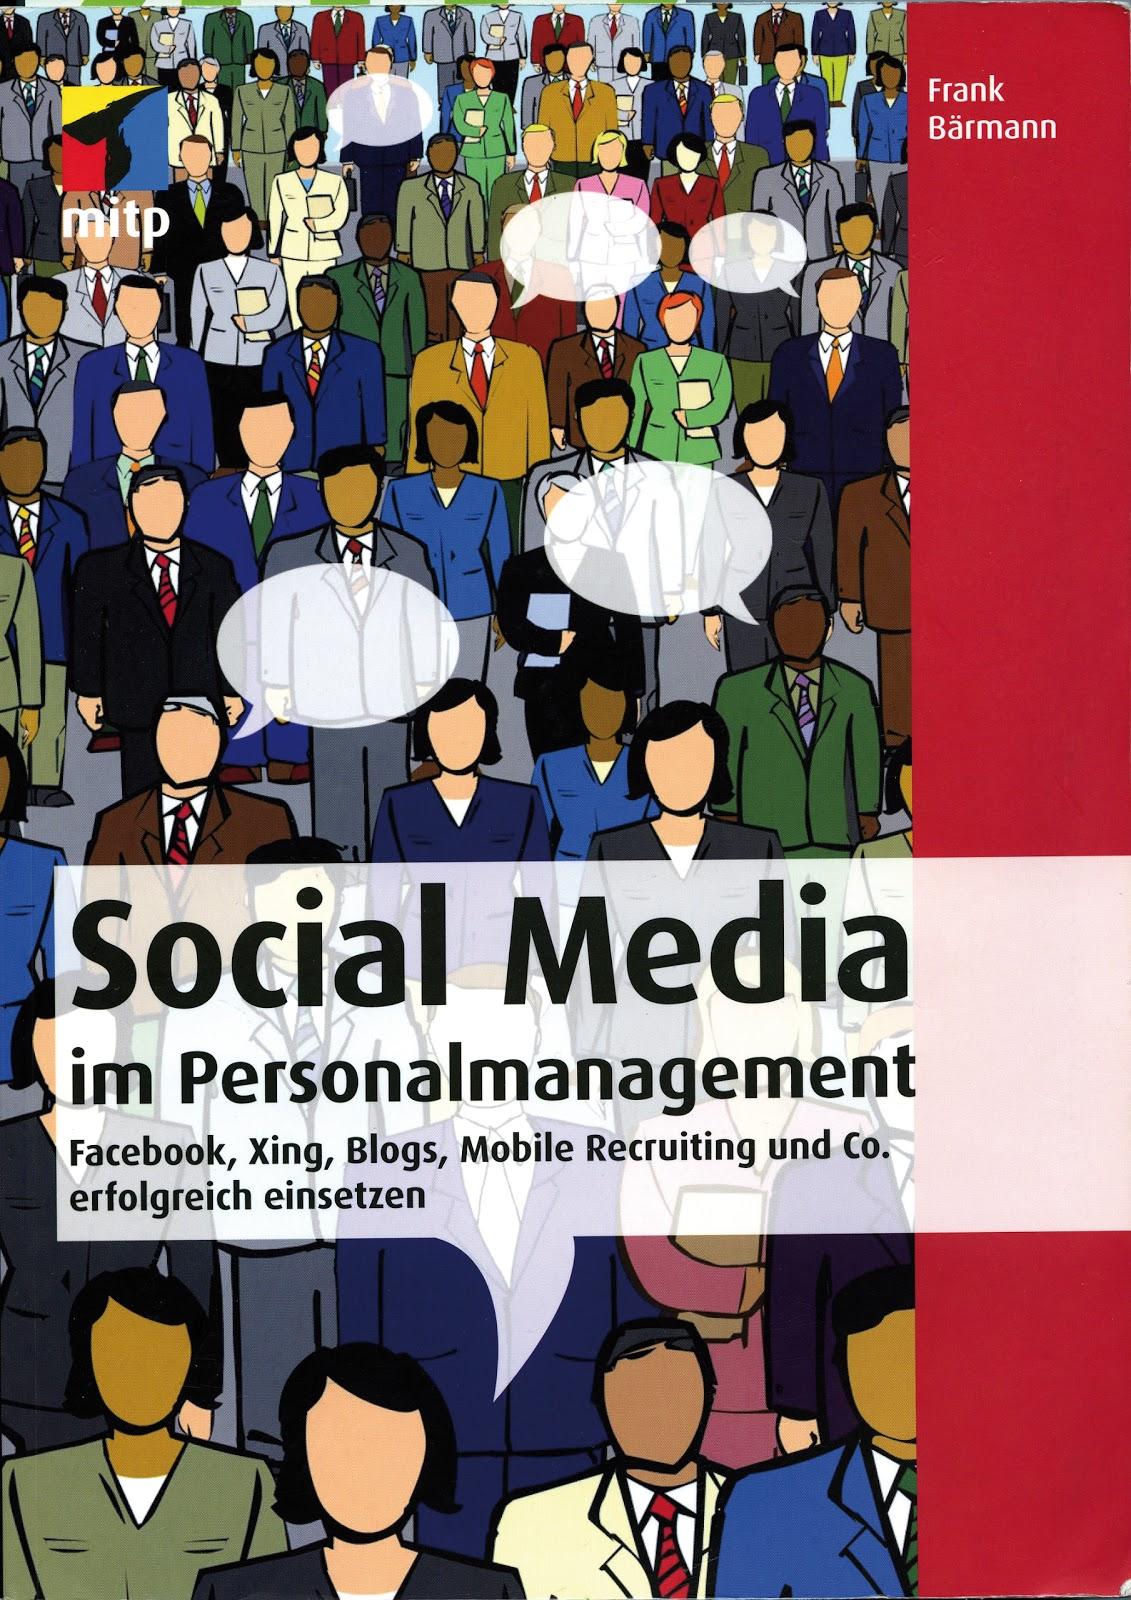 Buchkritik: Social Media im Personalmanagement